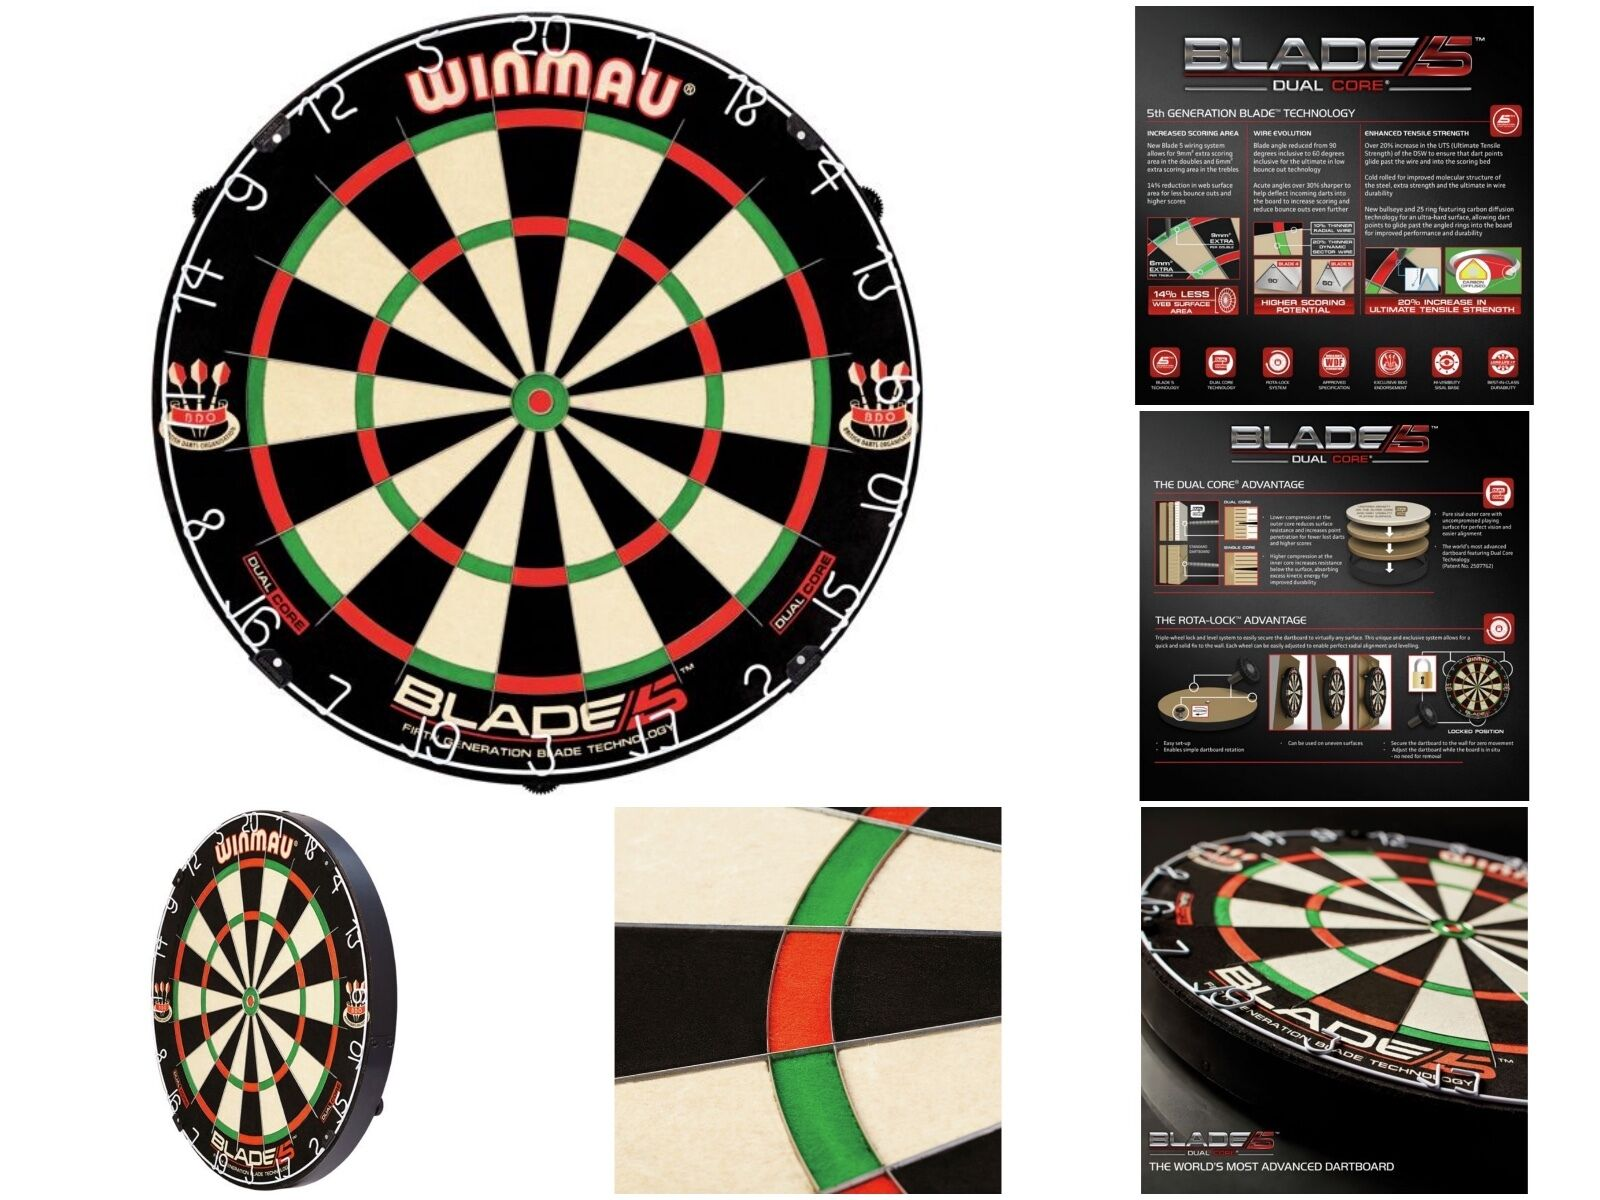 Professionelles Winmau Dart Board Blade 5 Dual Core Bristle Dartboard So gesehen im Fernsehen